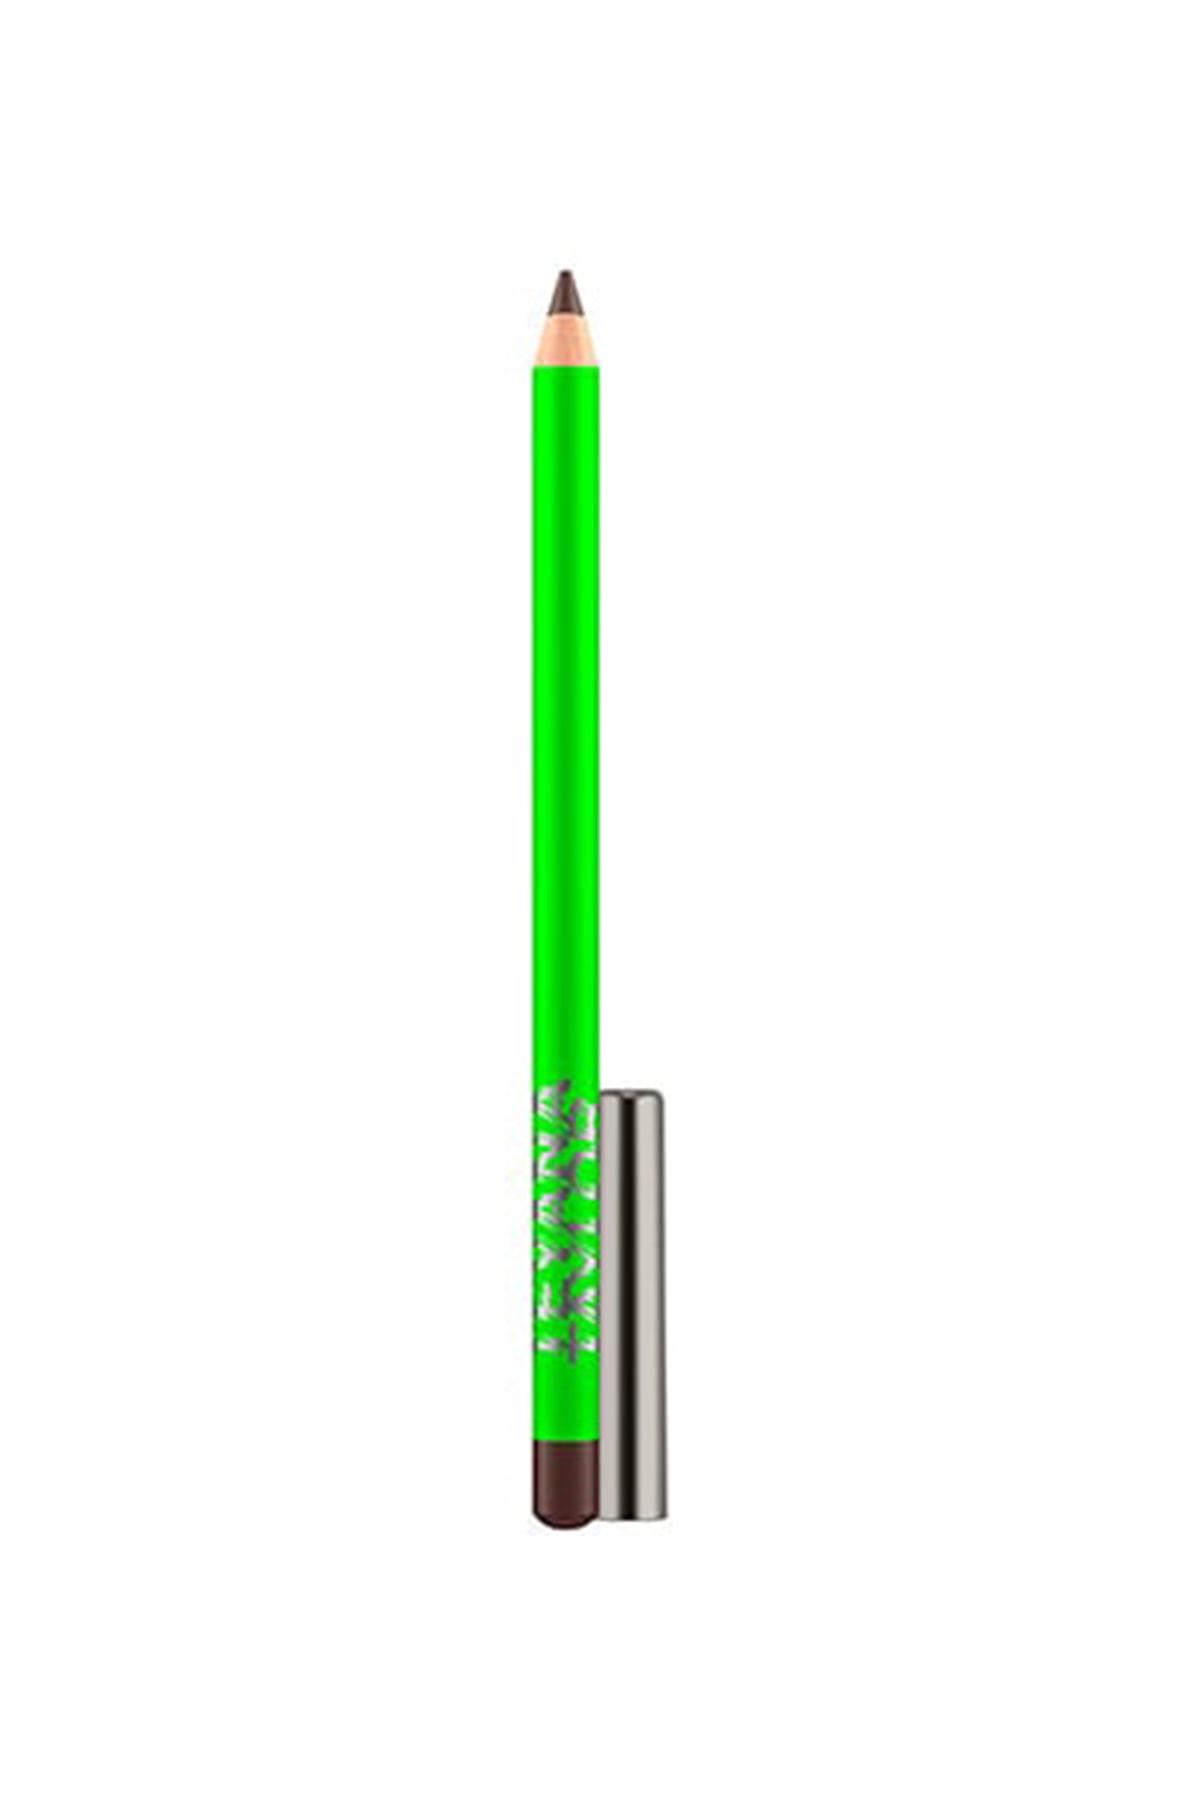 M.A.C Dudak Kalemi - Lip Pencil Teyana Taylor Chestnut 773602582693